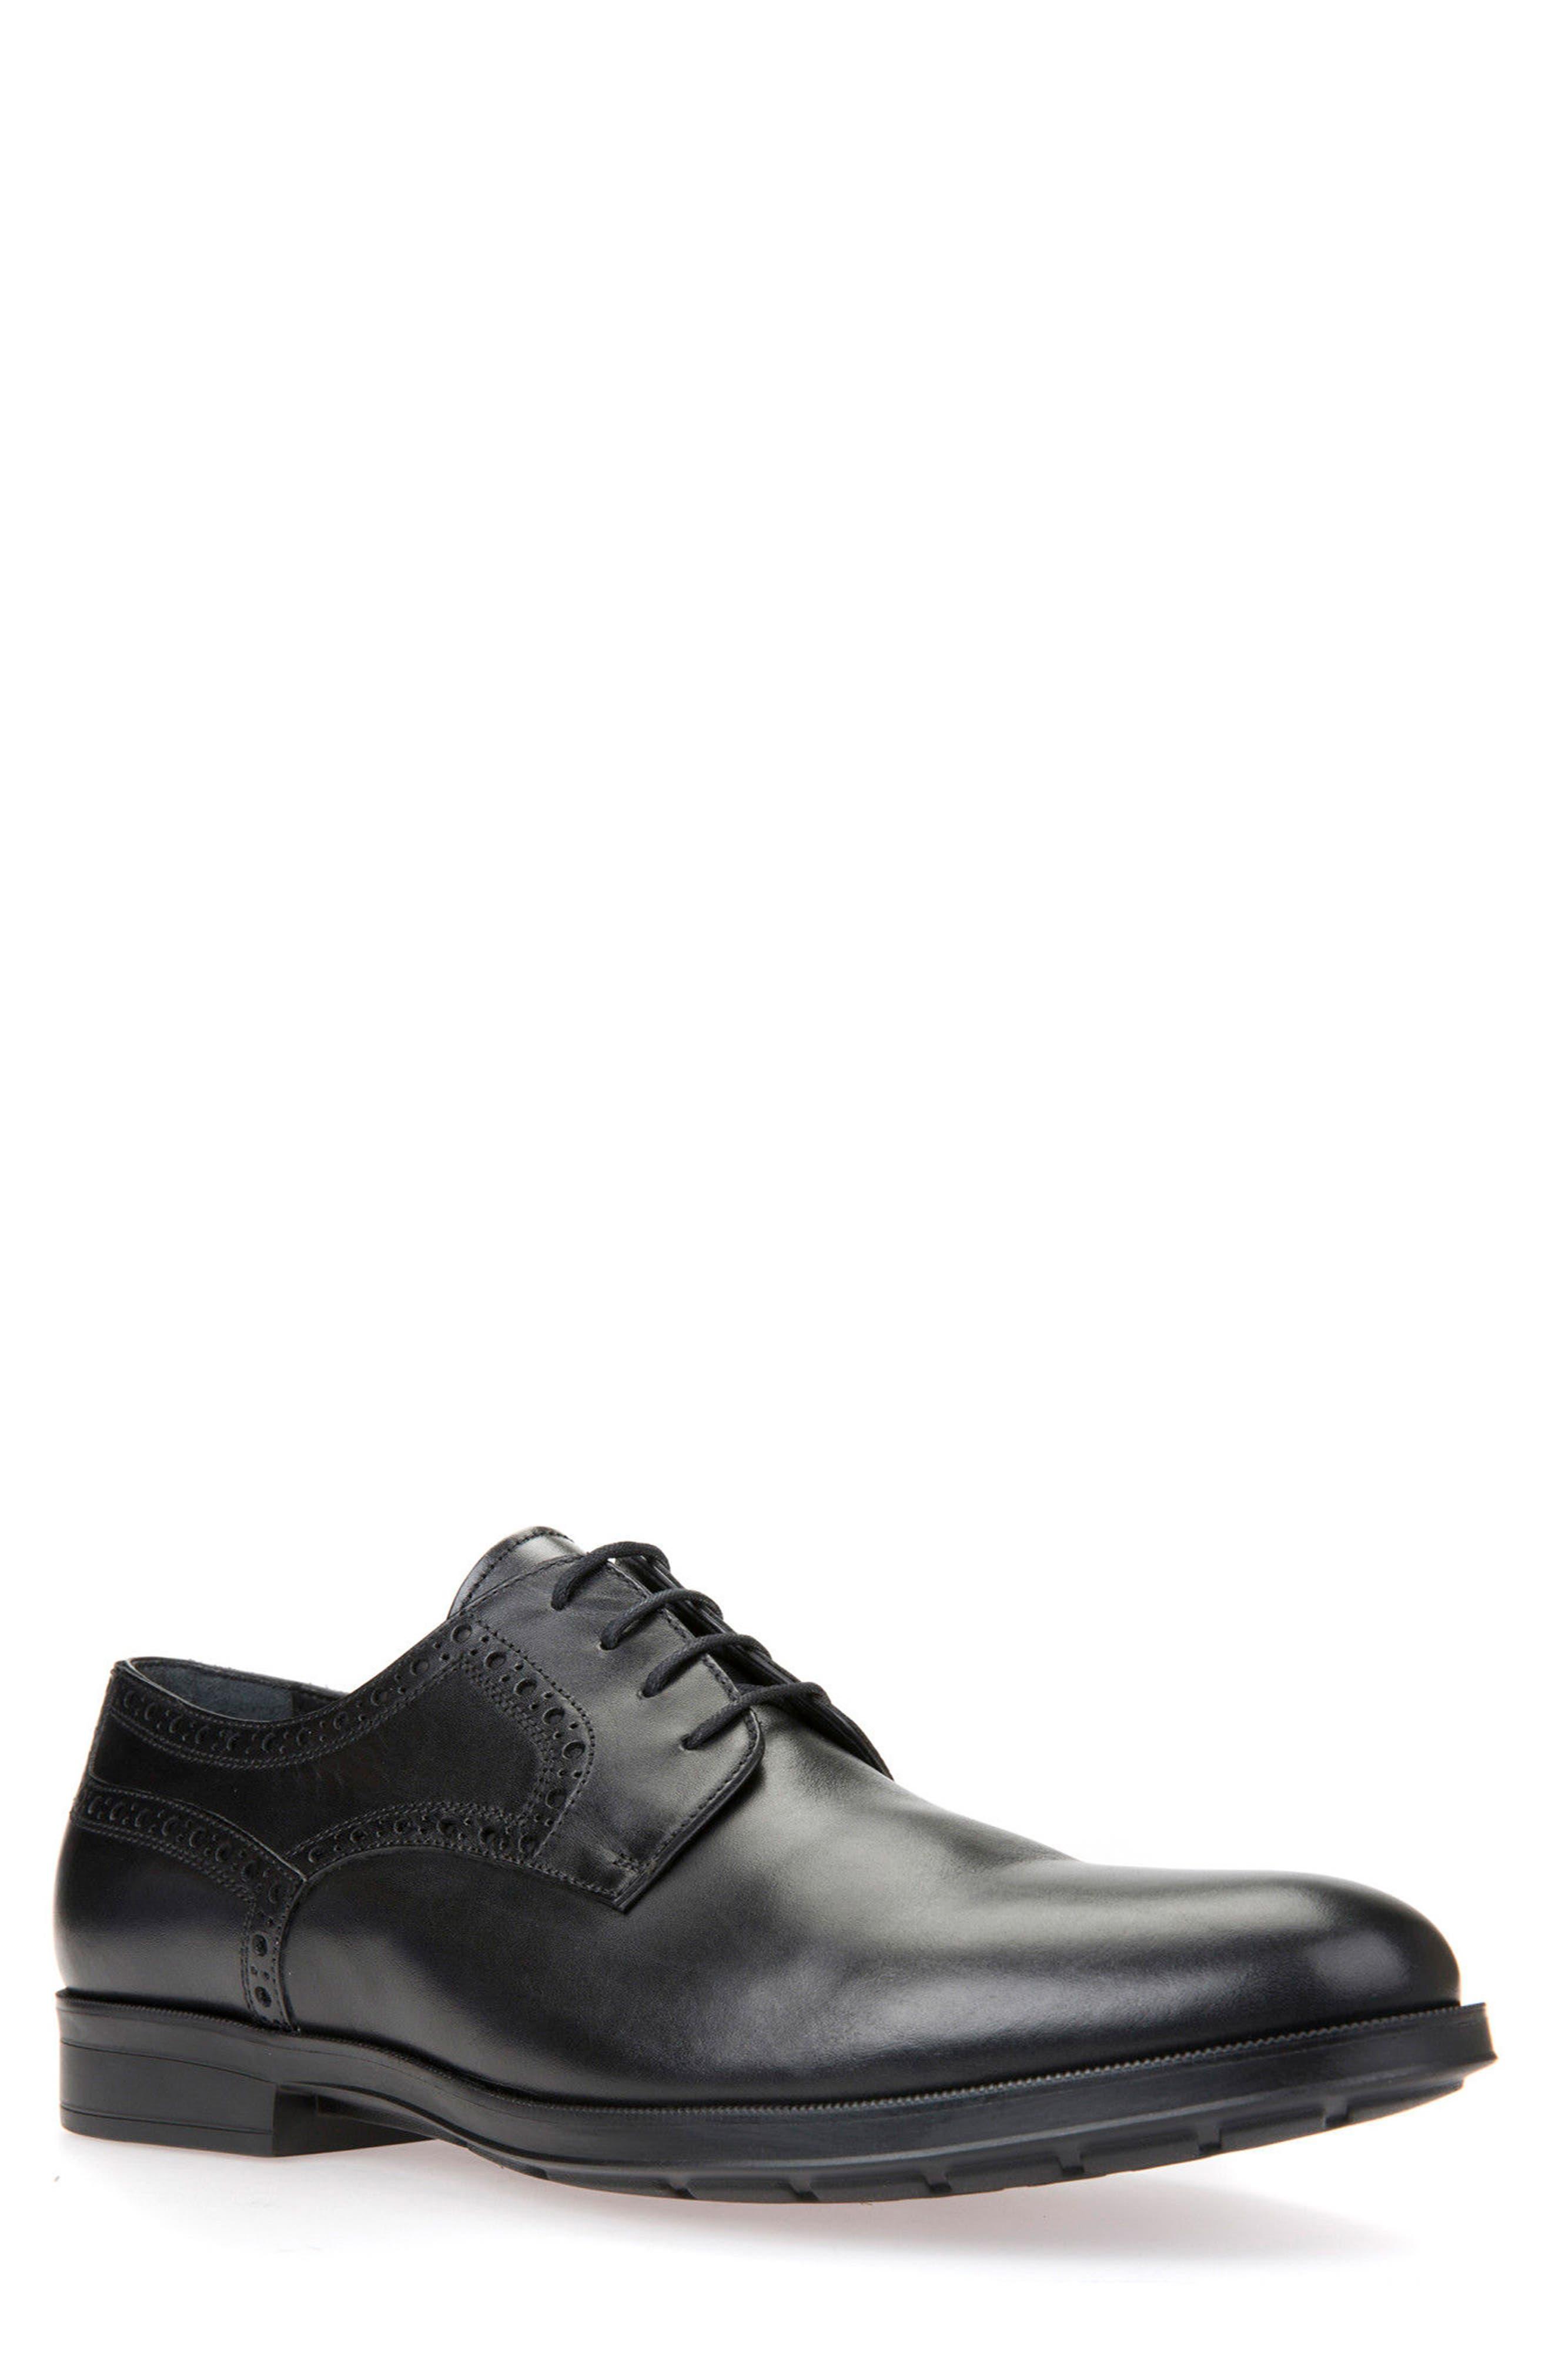 Alternate Image 1 Selected - Geox Hilstone 3 Plain Toe Derby (Men)